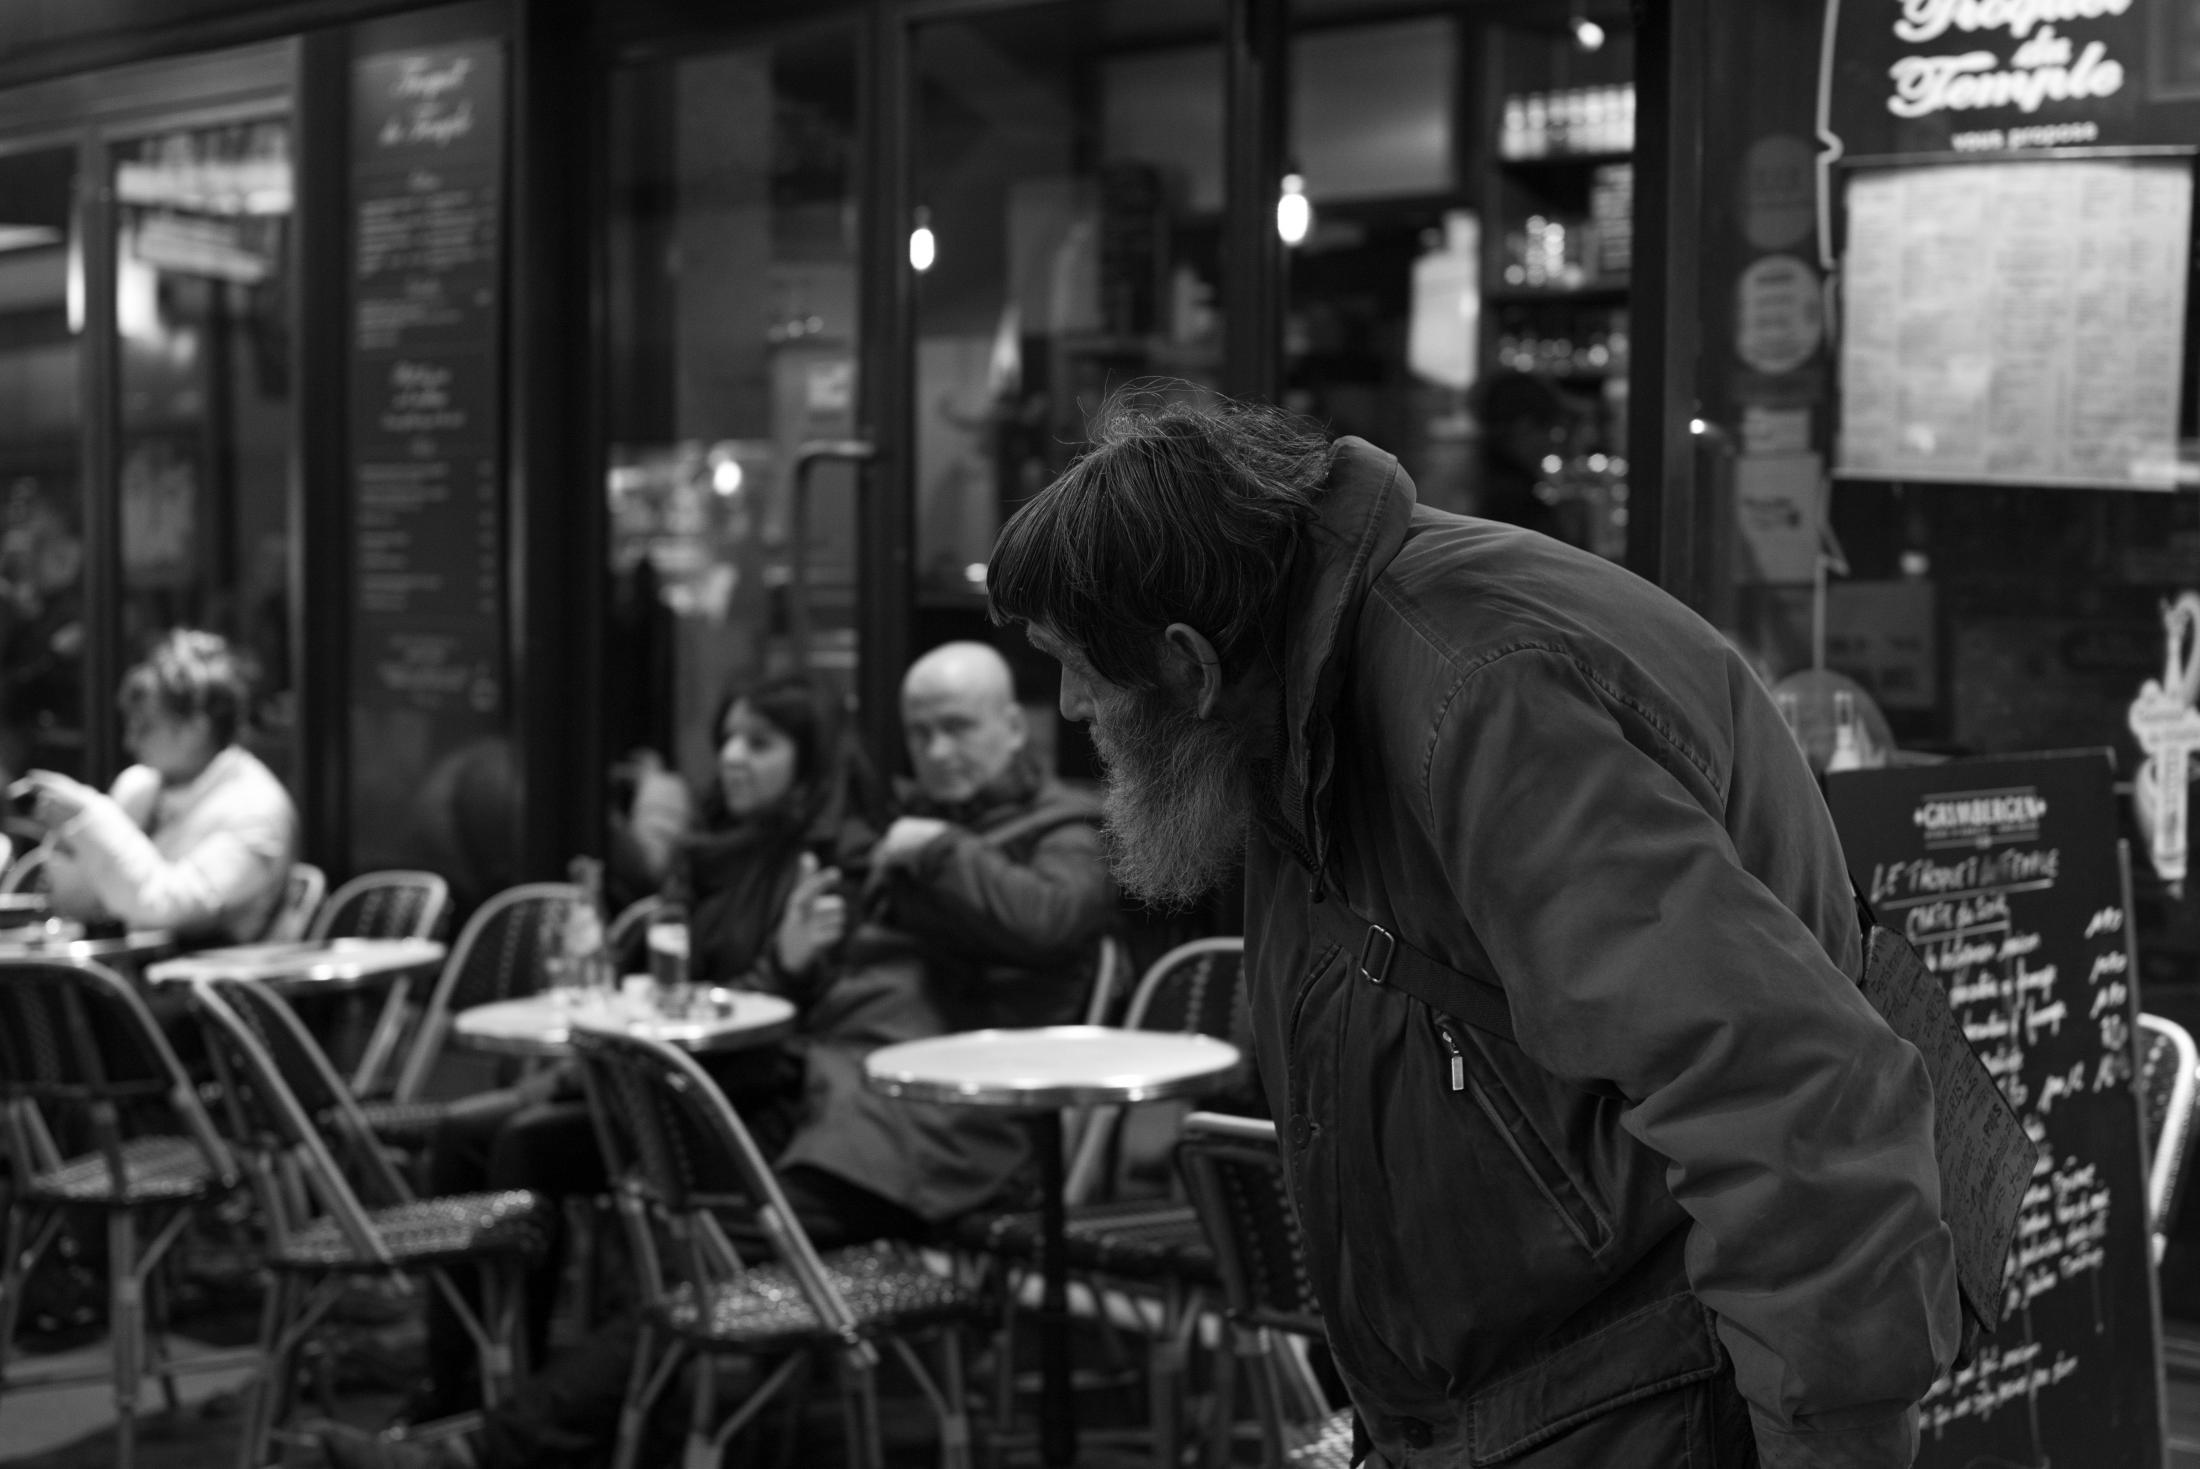 Living in Le Marais, Paris